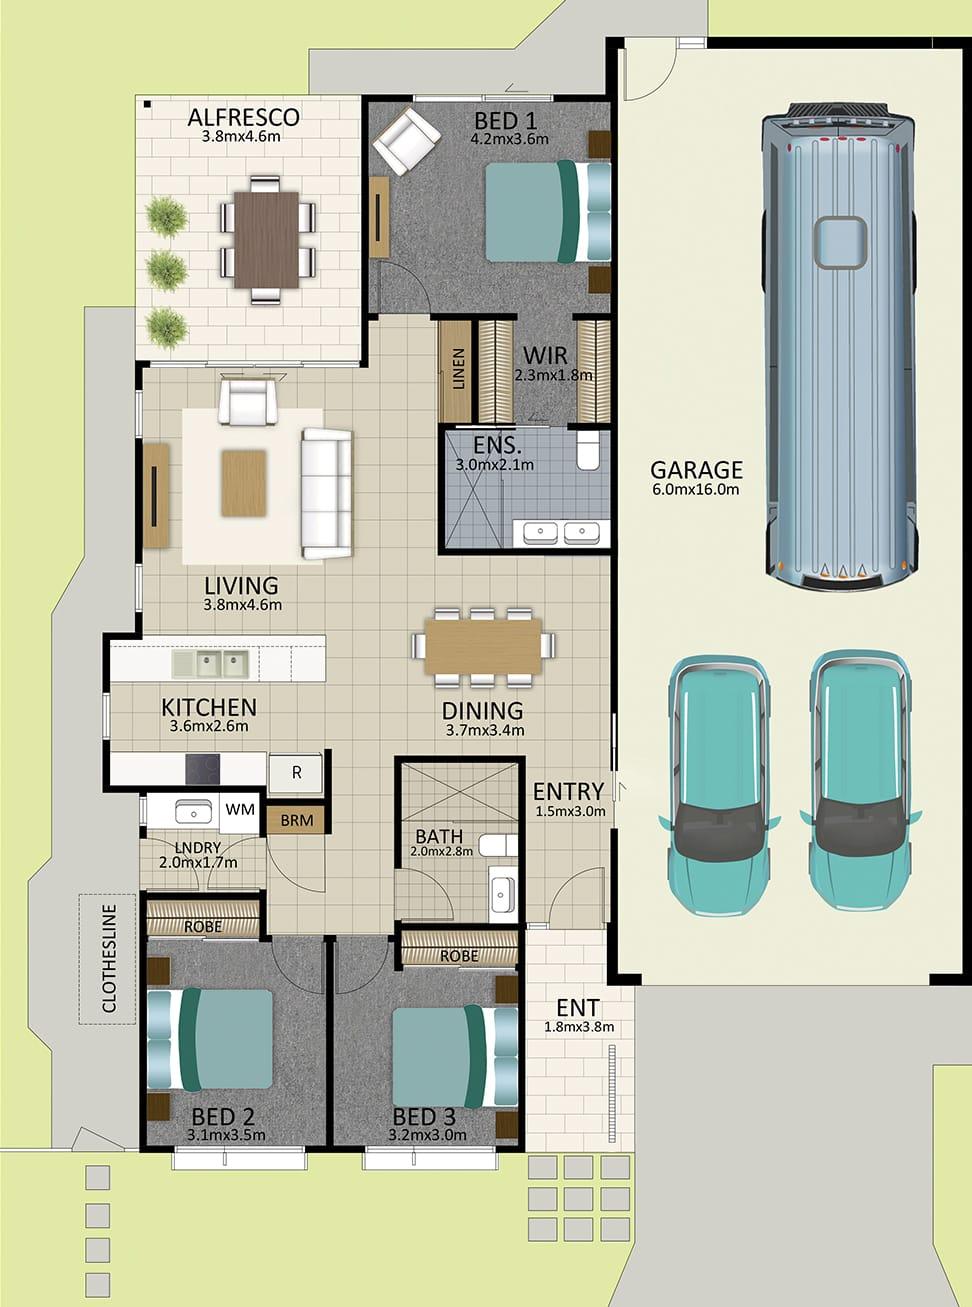 HR LAT25 Floorplan LOT 160 Watson OCT19 V1 - Lot 160